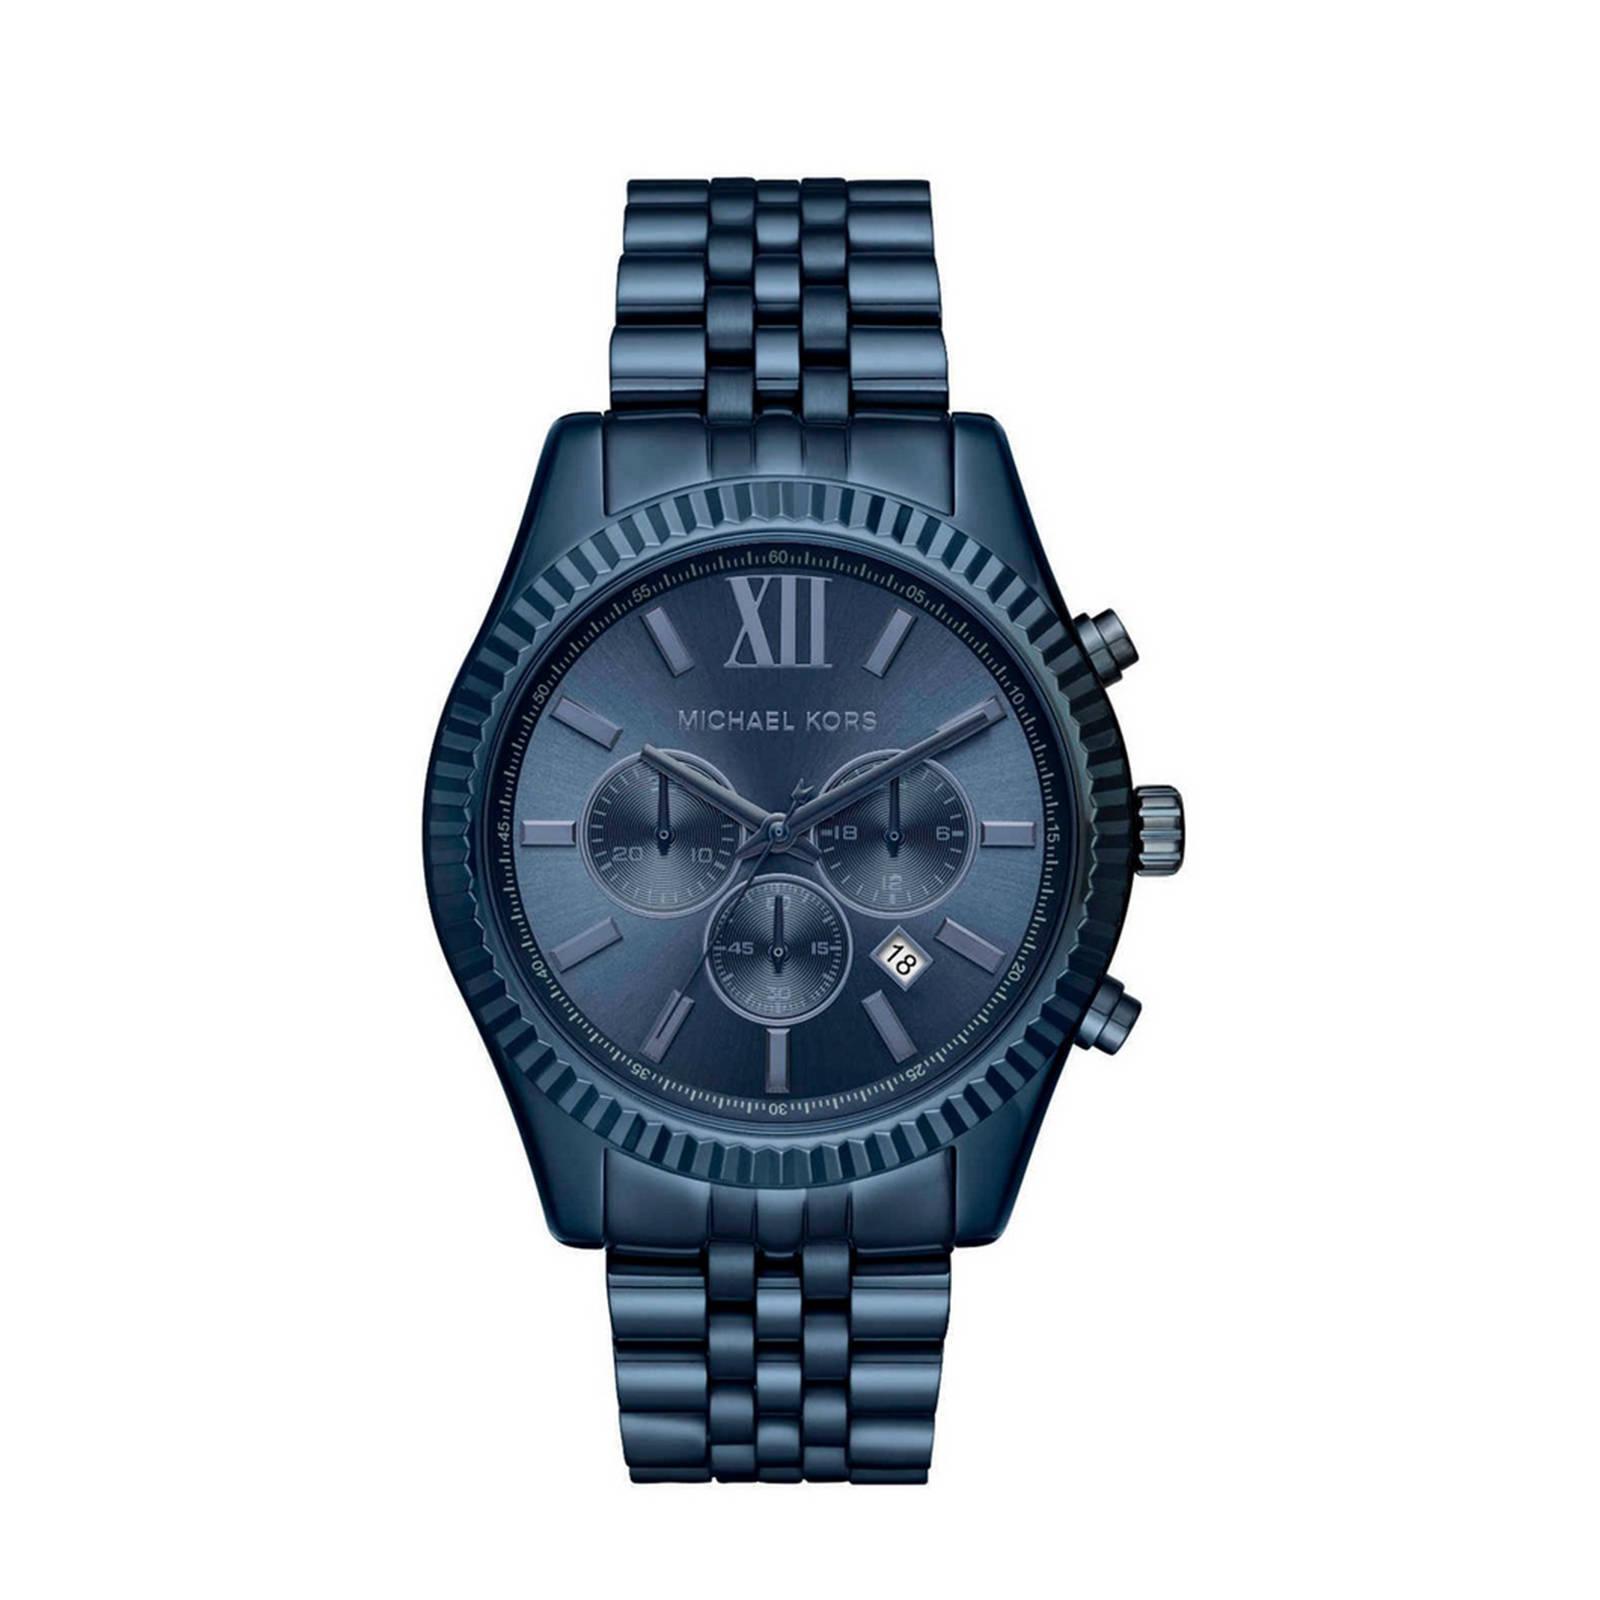 Michael Kors Lexington horloge MK8480 | wehkamp